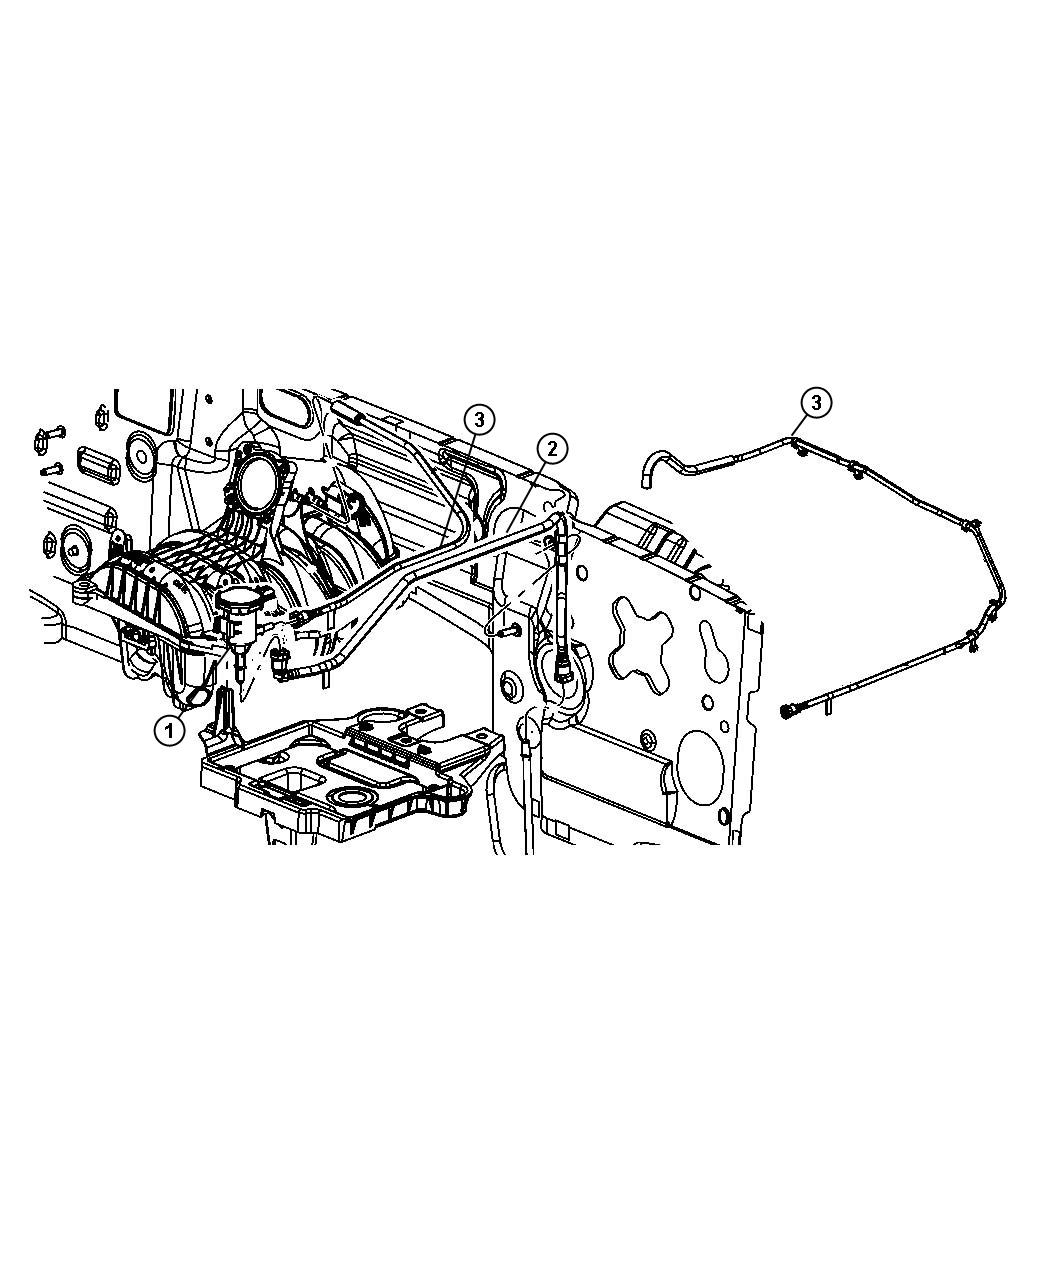 Dodge NITRO Harness. Vapor purge. Emission, vacuum